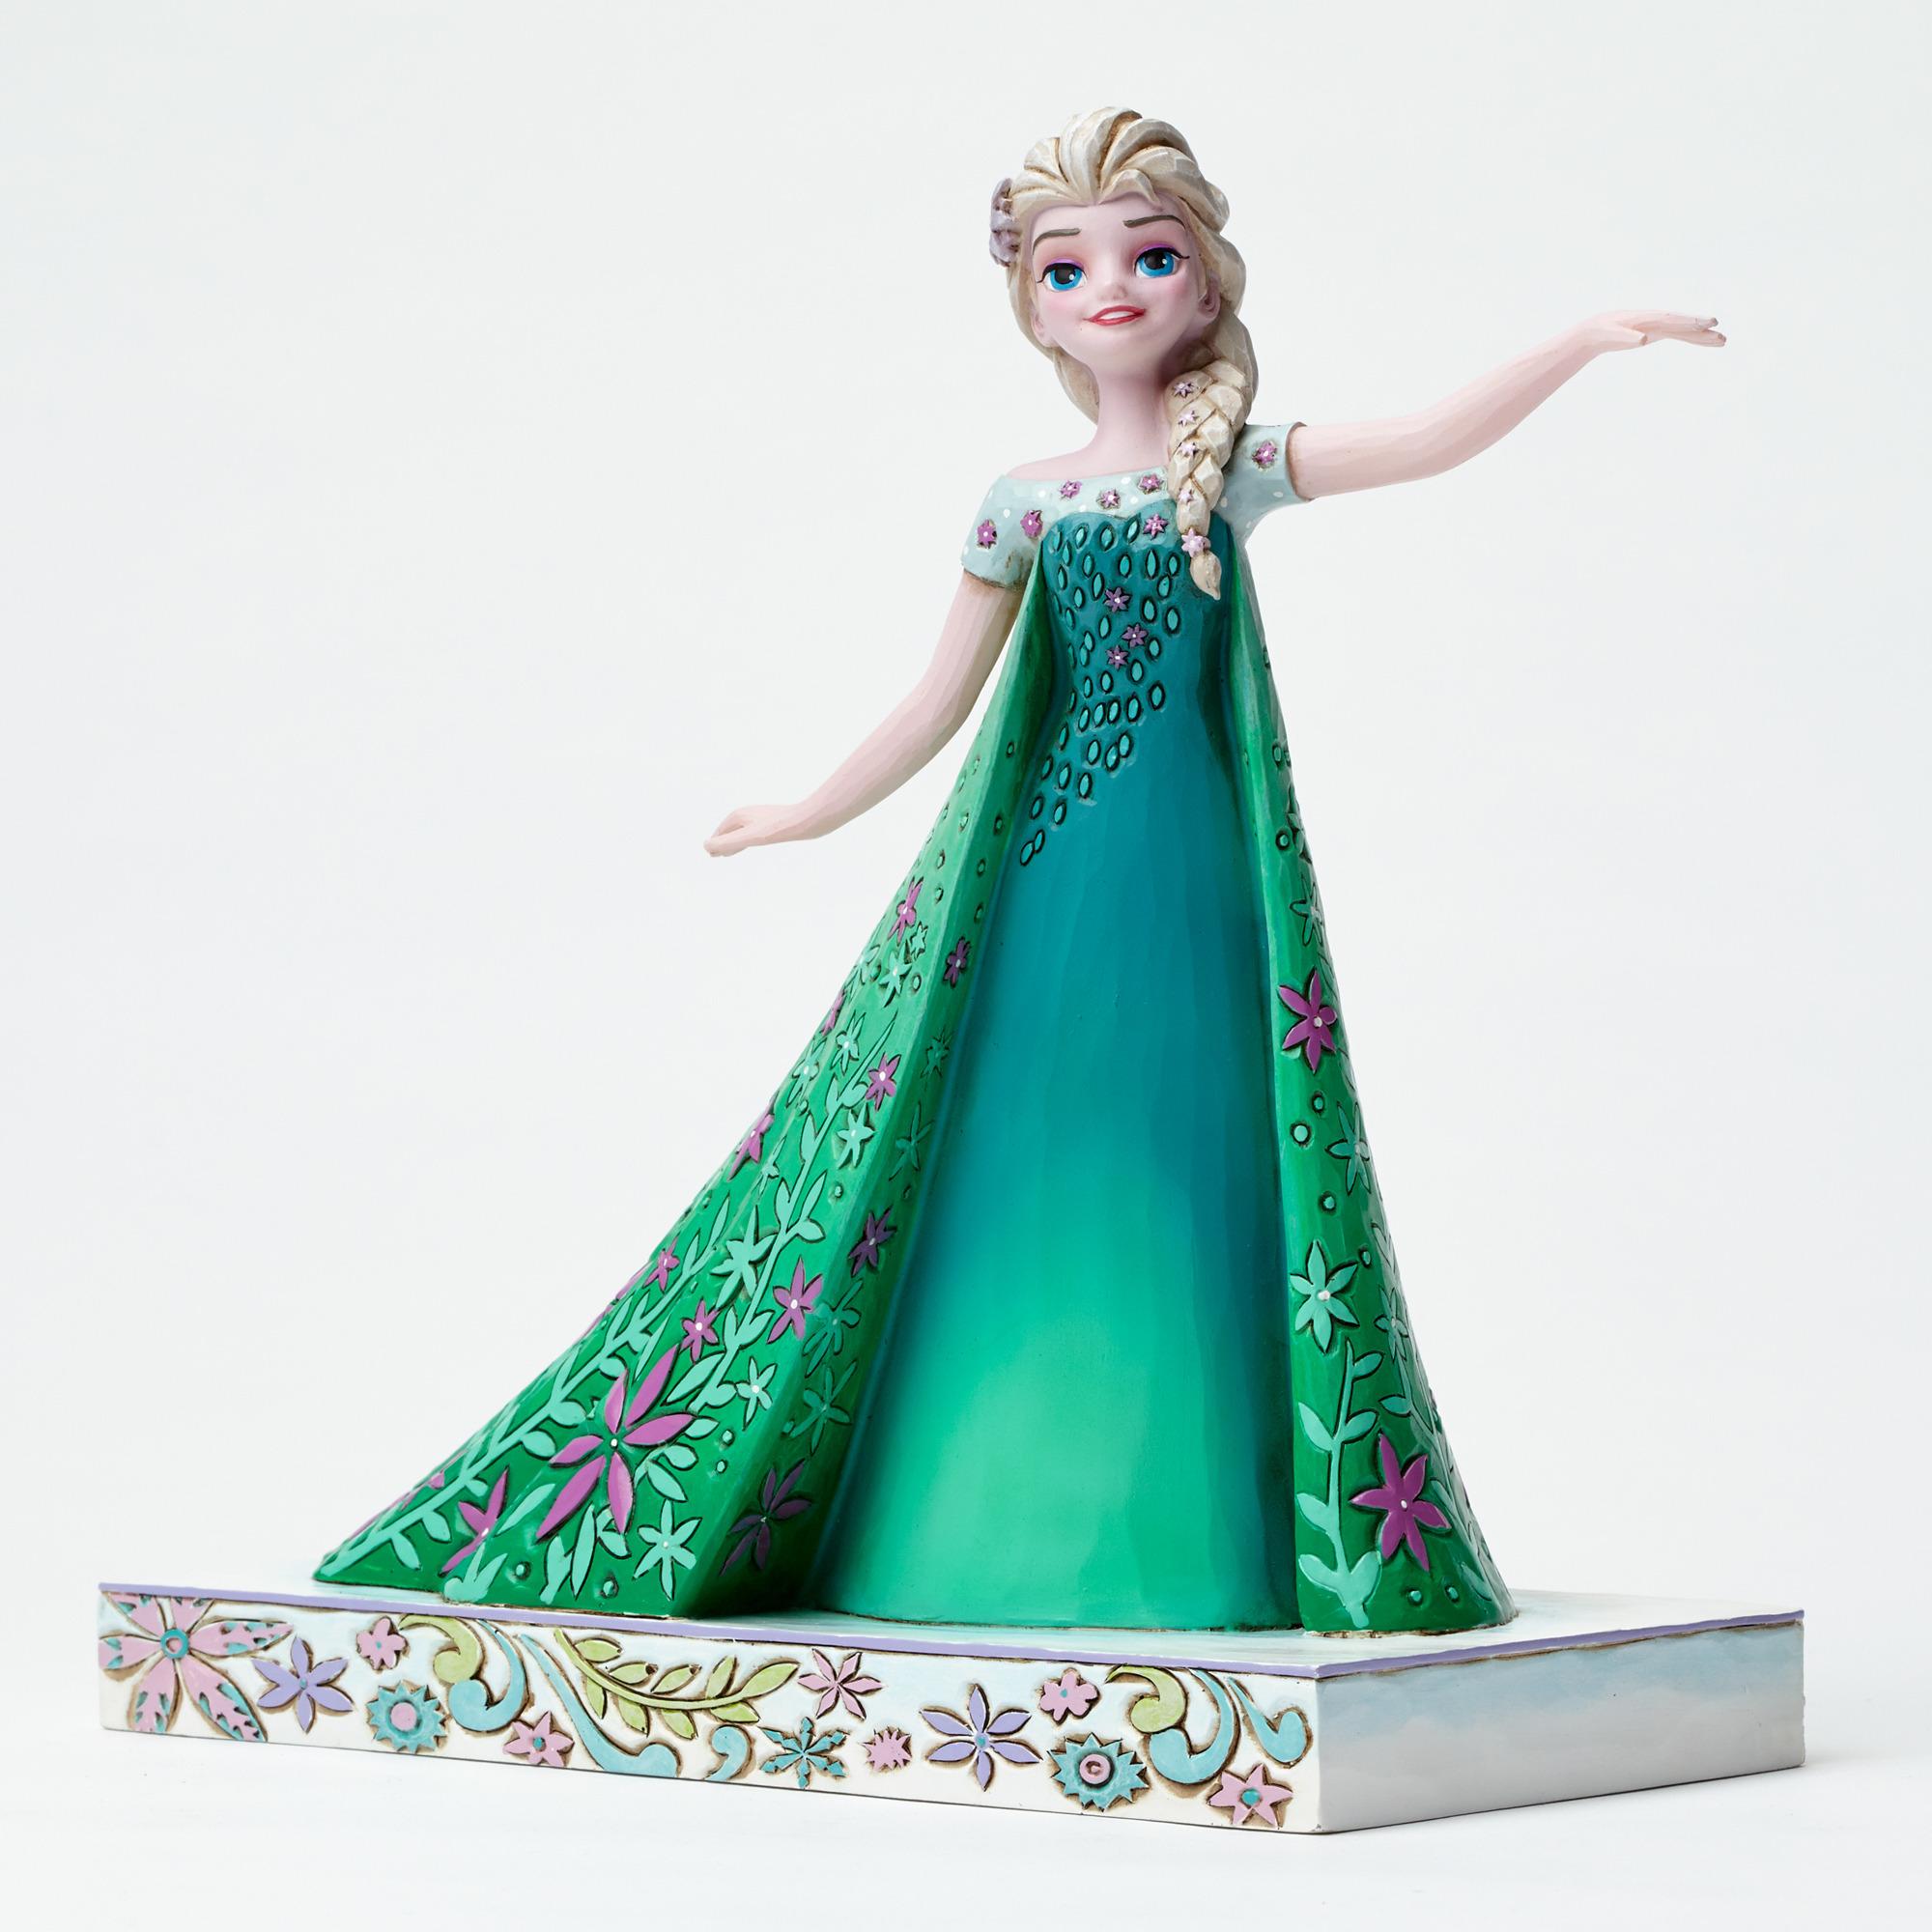 DISNEY TRADITIONS 4050881 Elsa From Frozen Fever